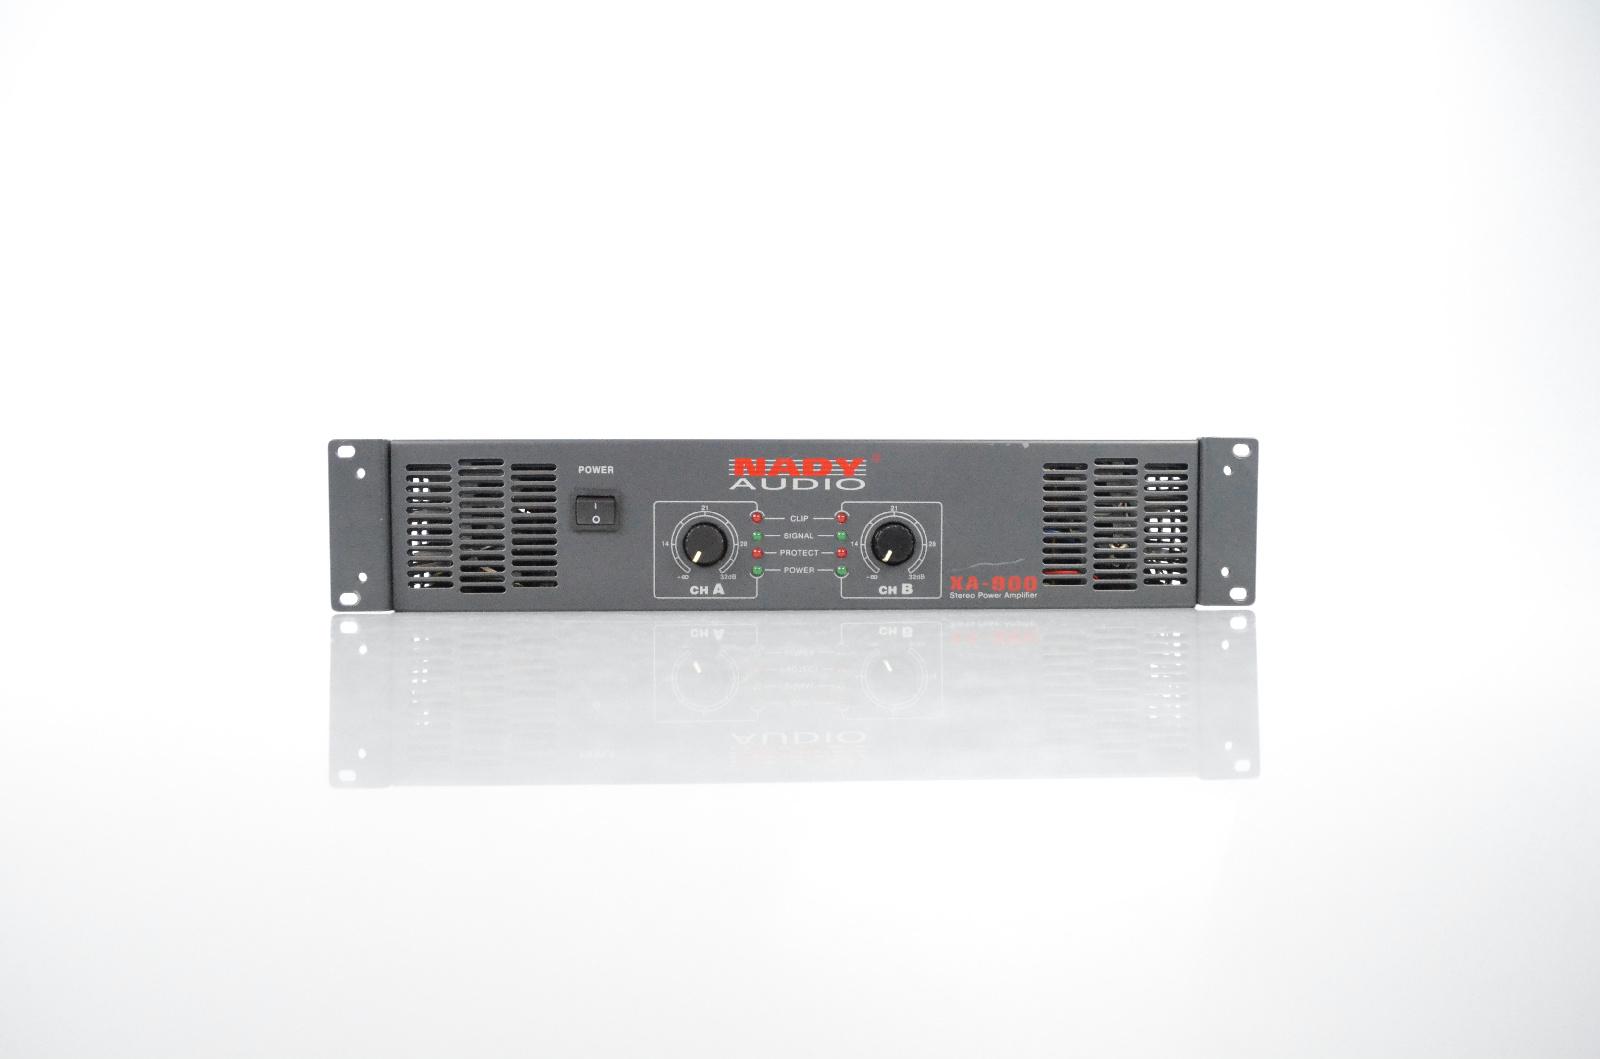 Nady Audio XA-900 Stereo Power Amp Amplifier #32180